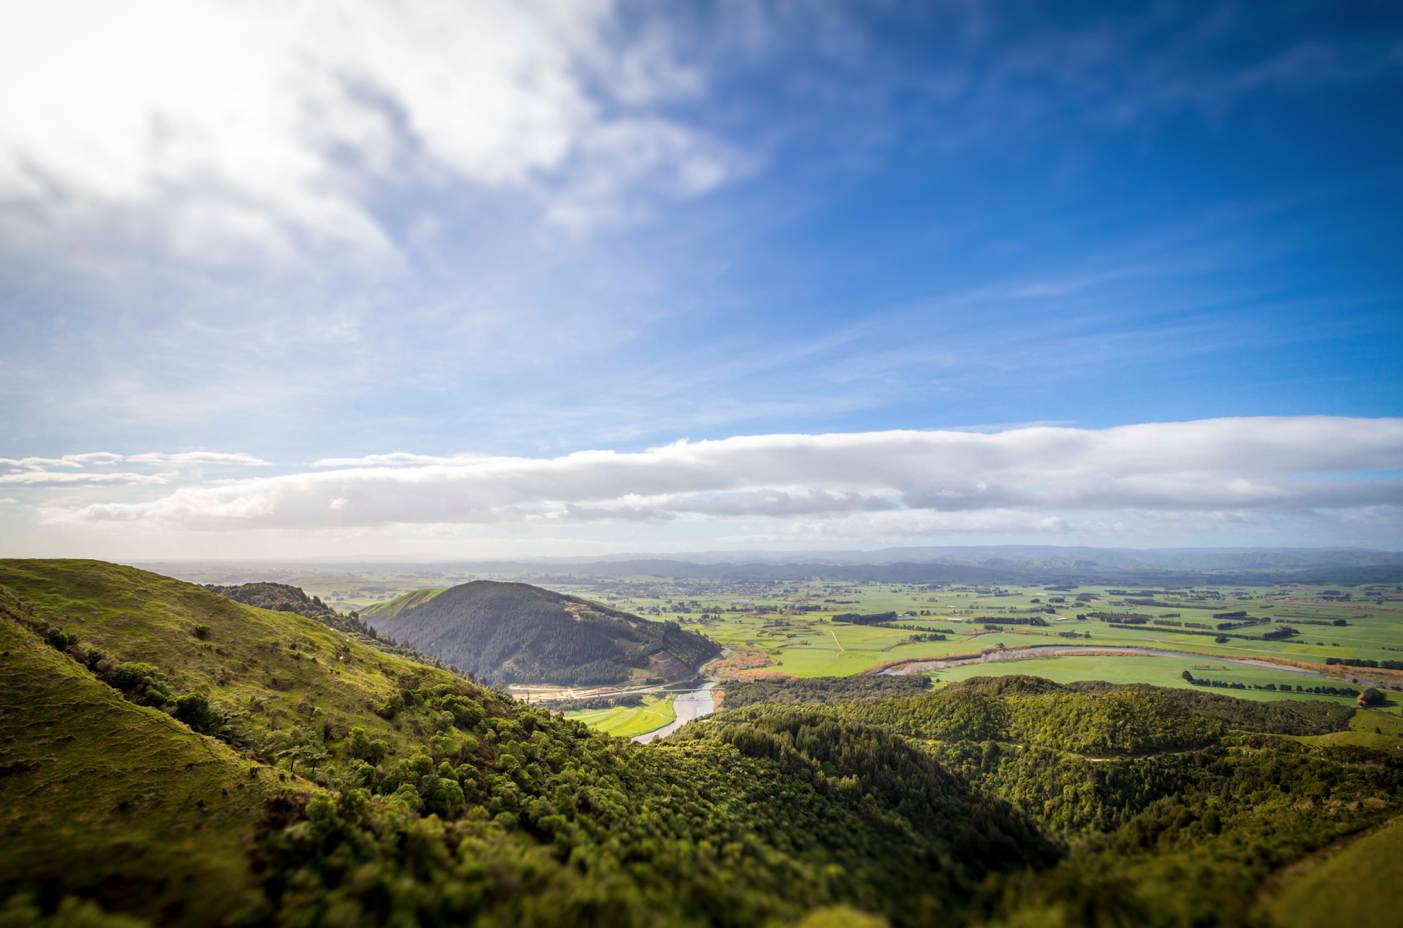 Ricoh, doing their bit to keep NZ beautiful!